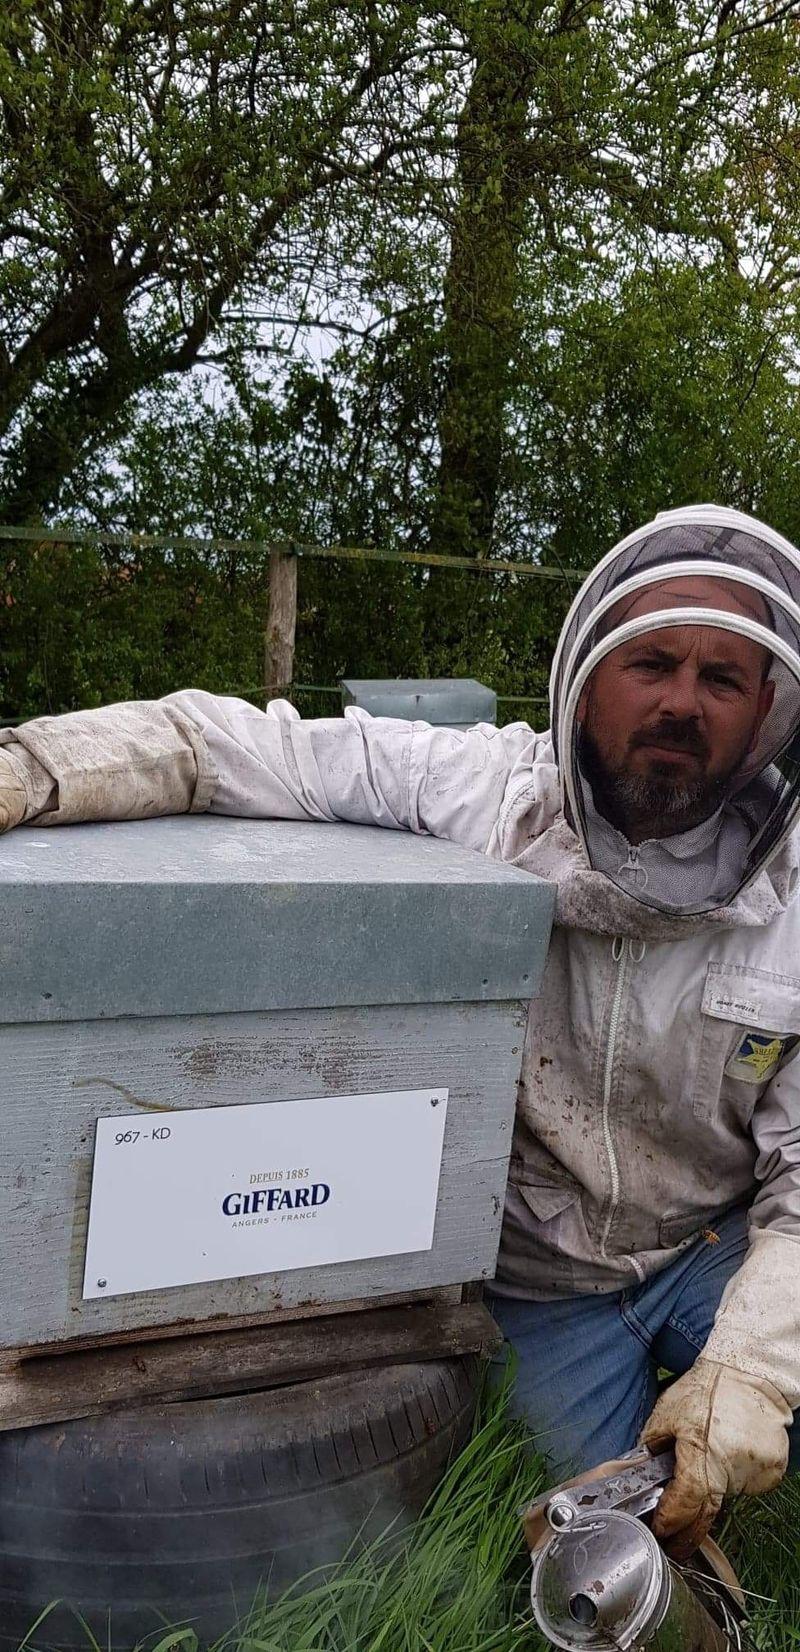 La ruche Giffard